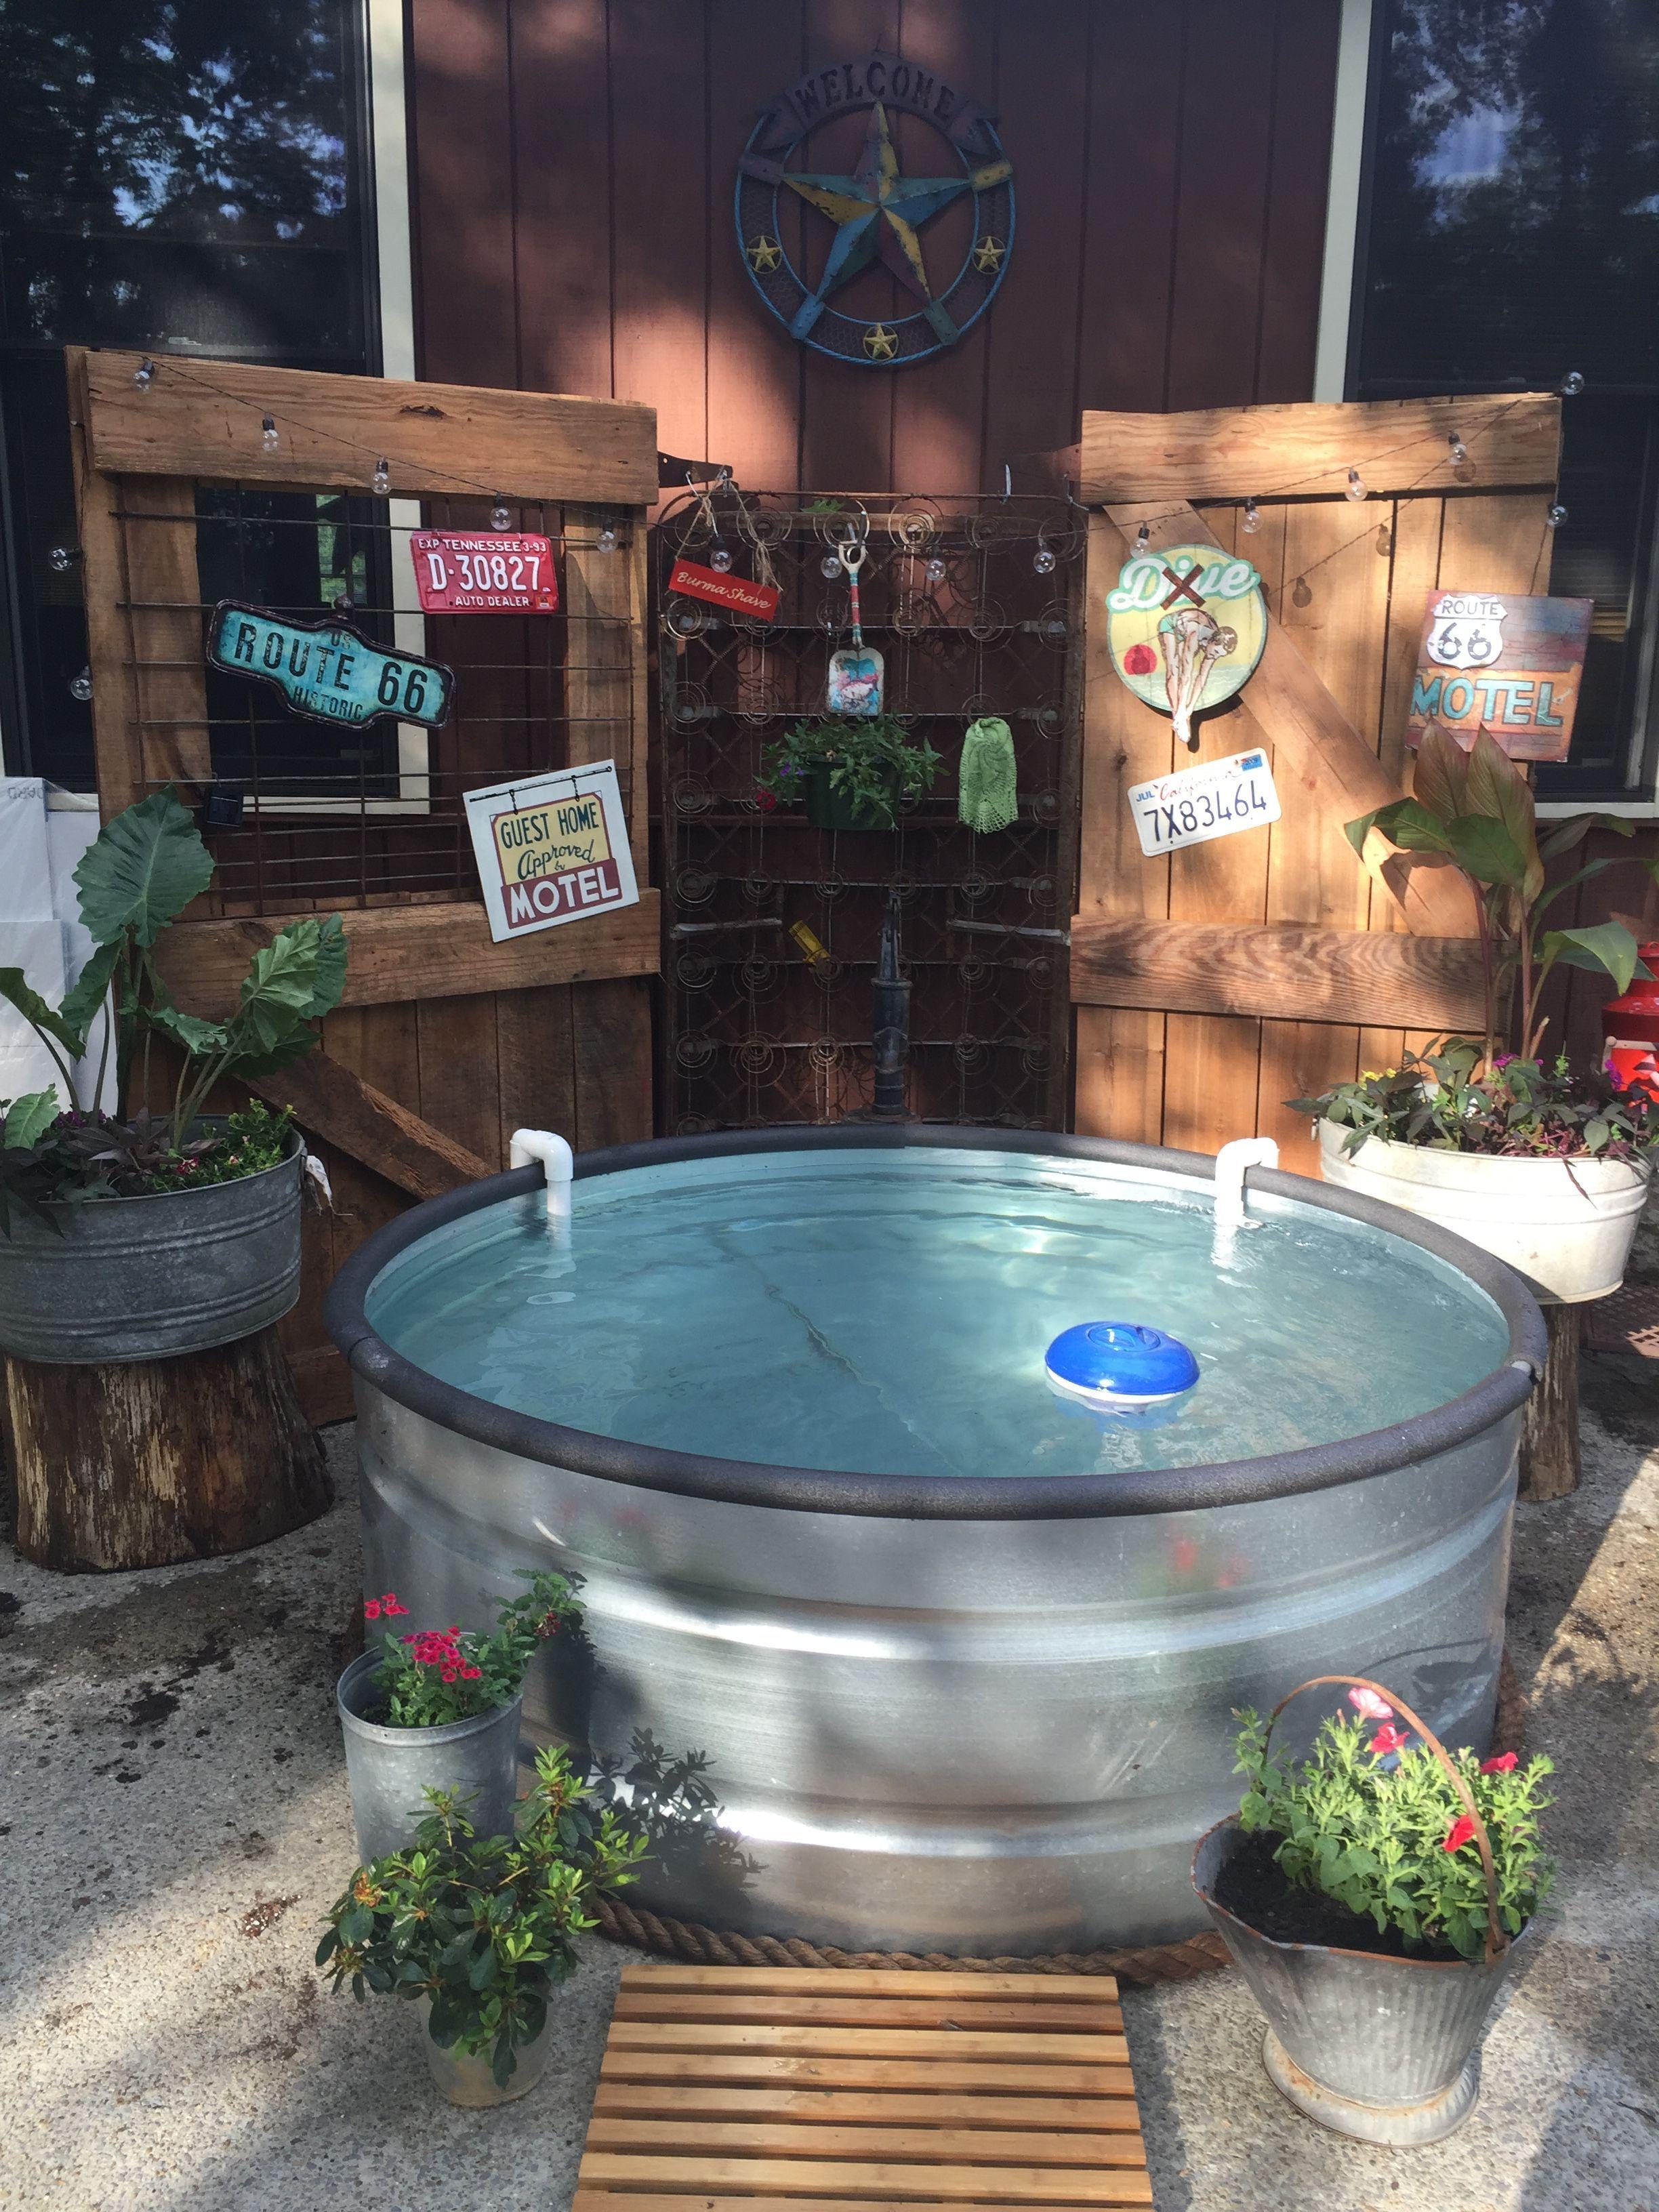 DIY Galvanized Stock Tank Pool to Beat The Summer Heat